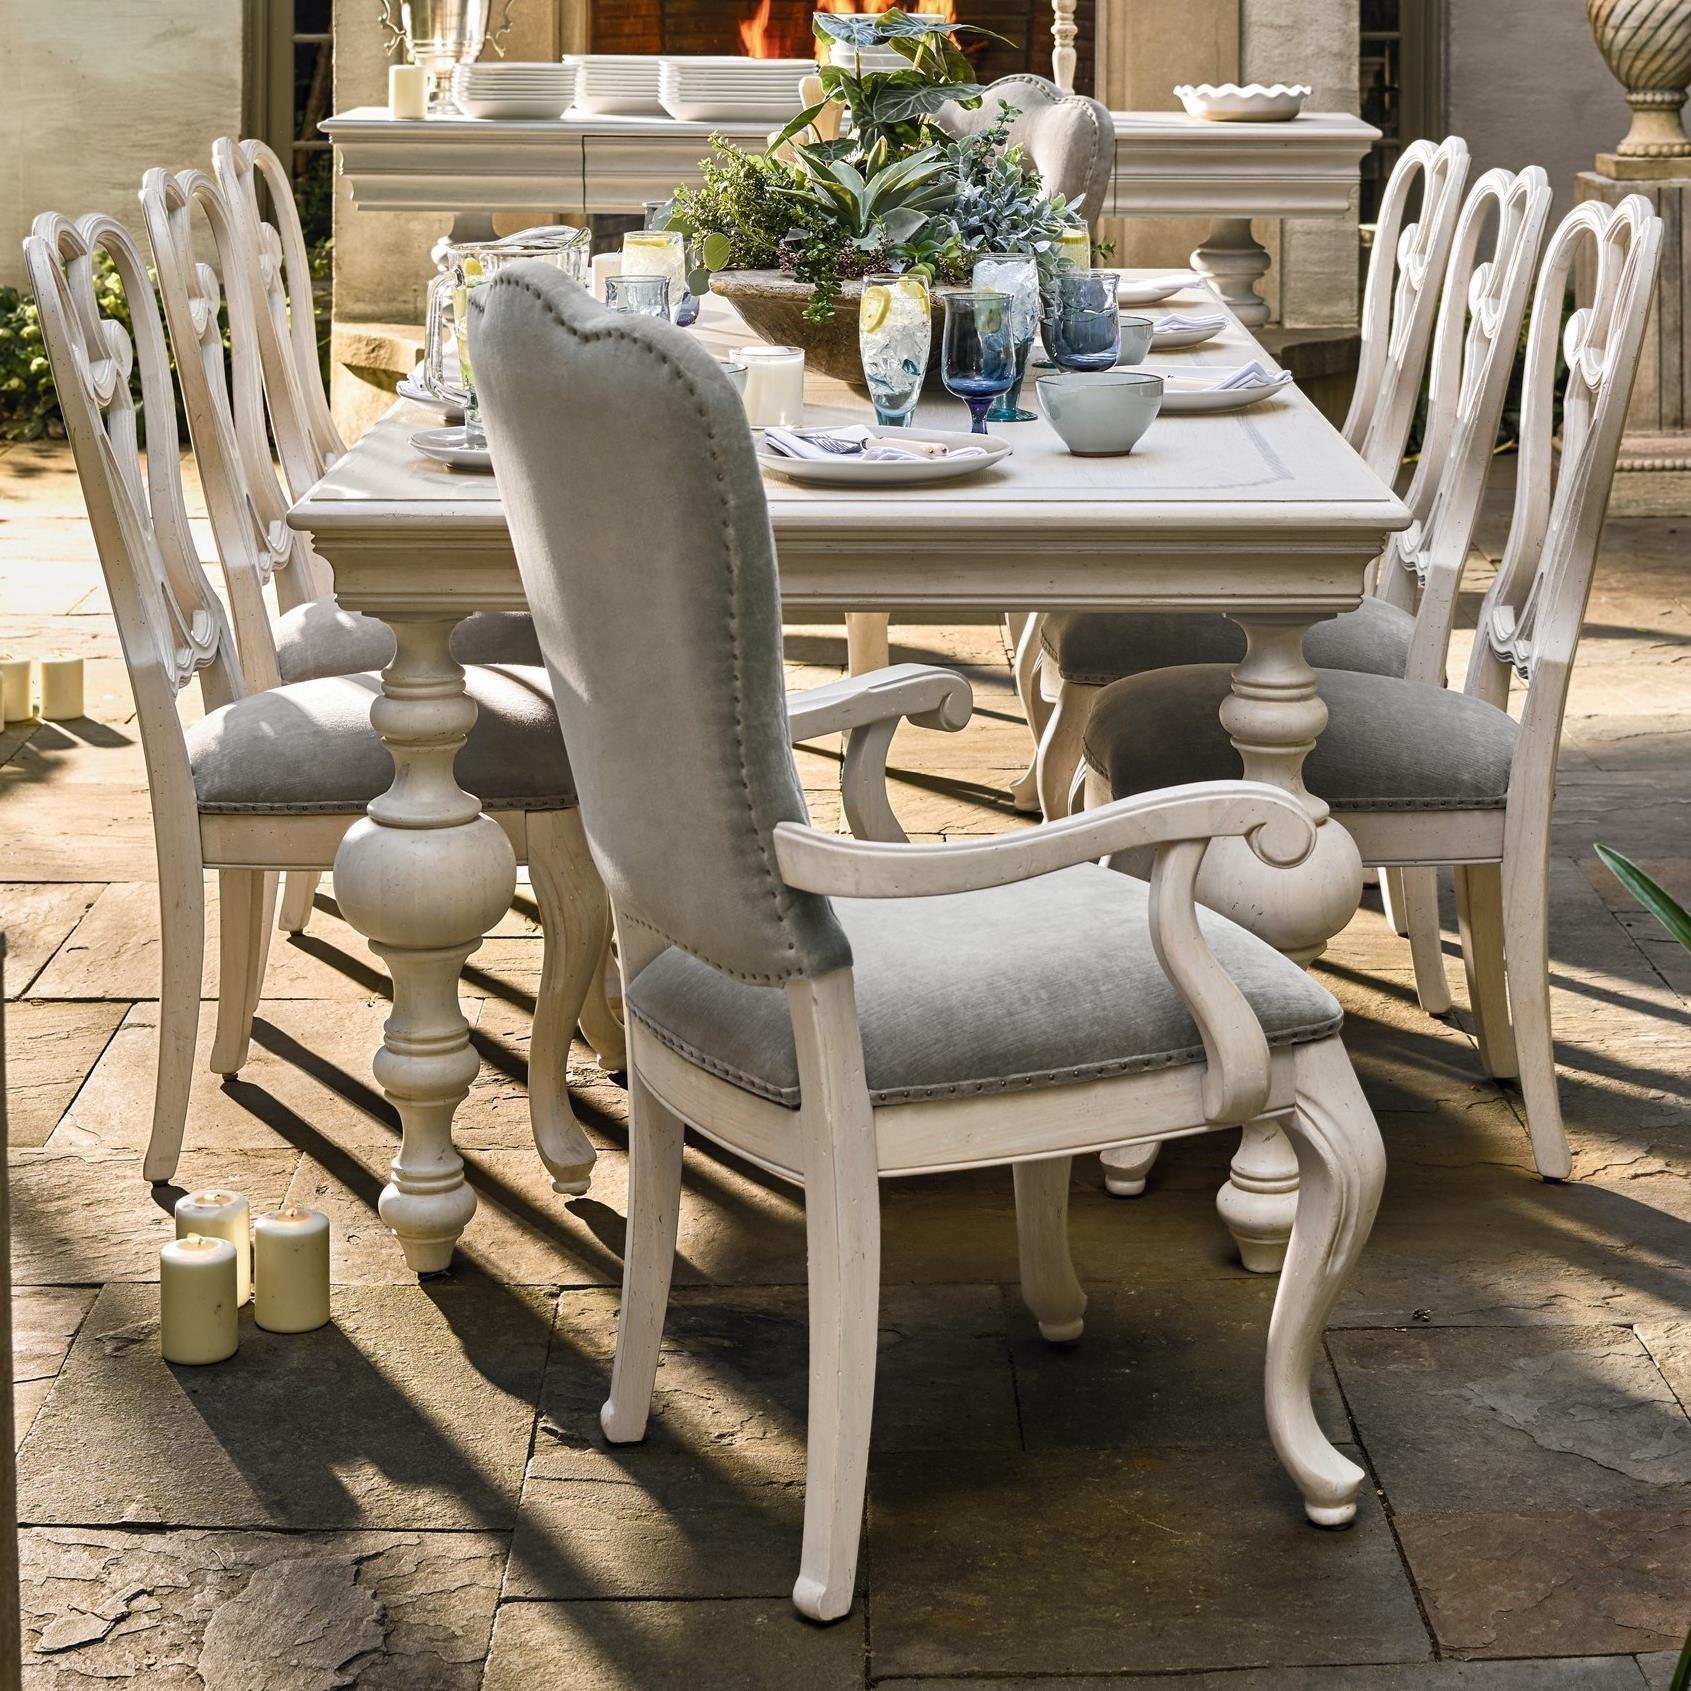 Morris Home Furnishings Élan Elance 5-Piece Dining Set - Item Number: 358466931